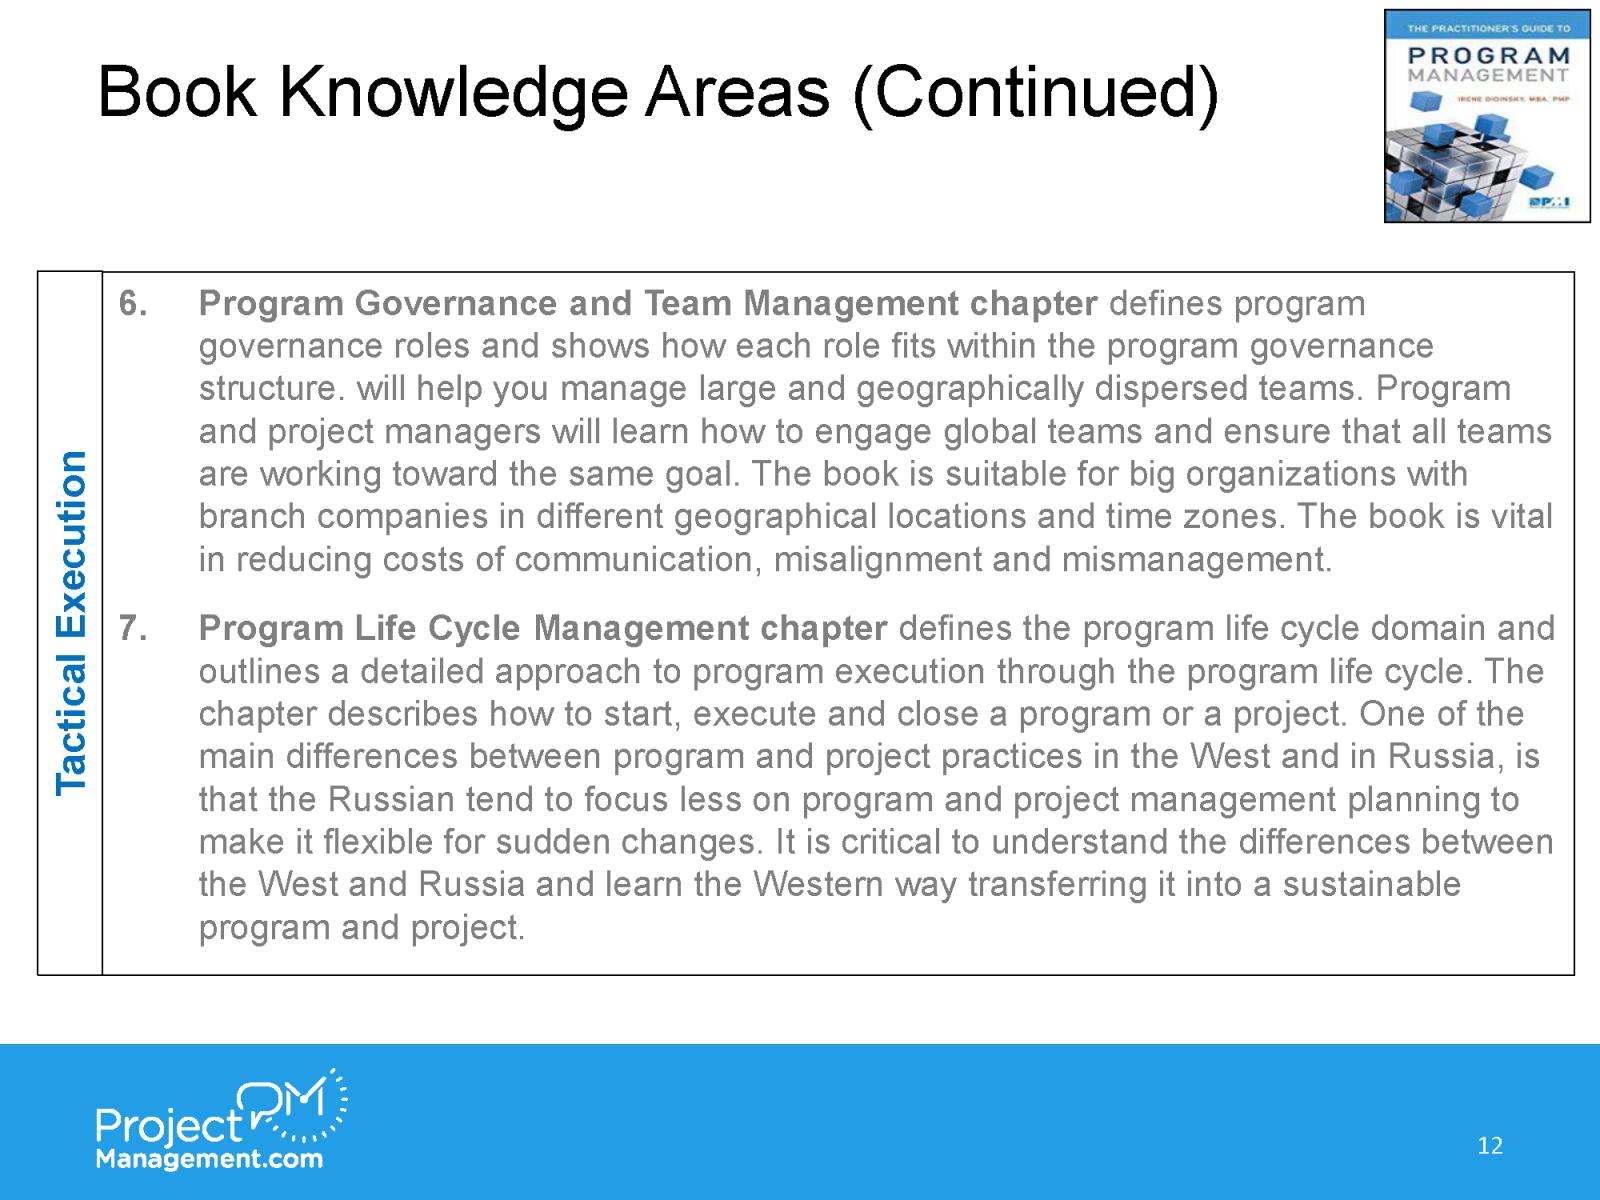 ProjectManagementcom webinar_Irene Didinsky_05112018_FinalFinal_Page_12